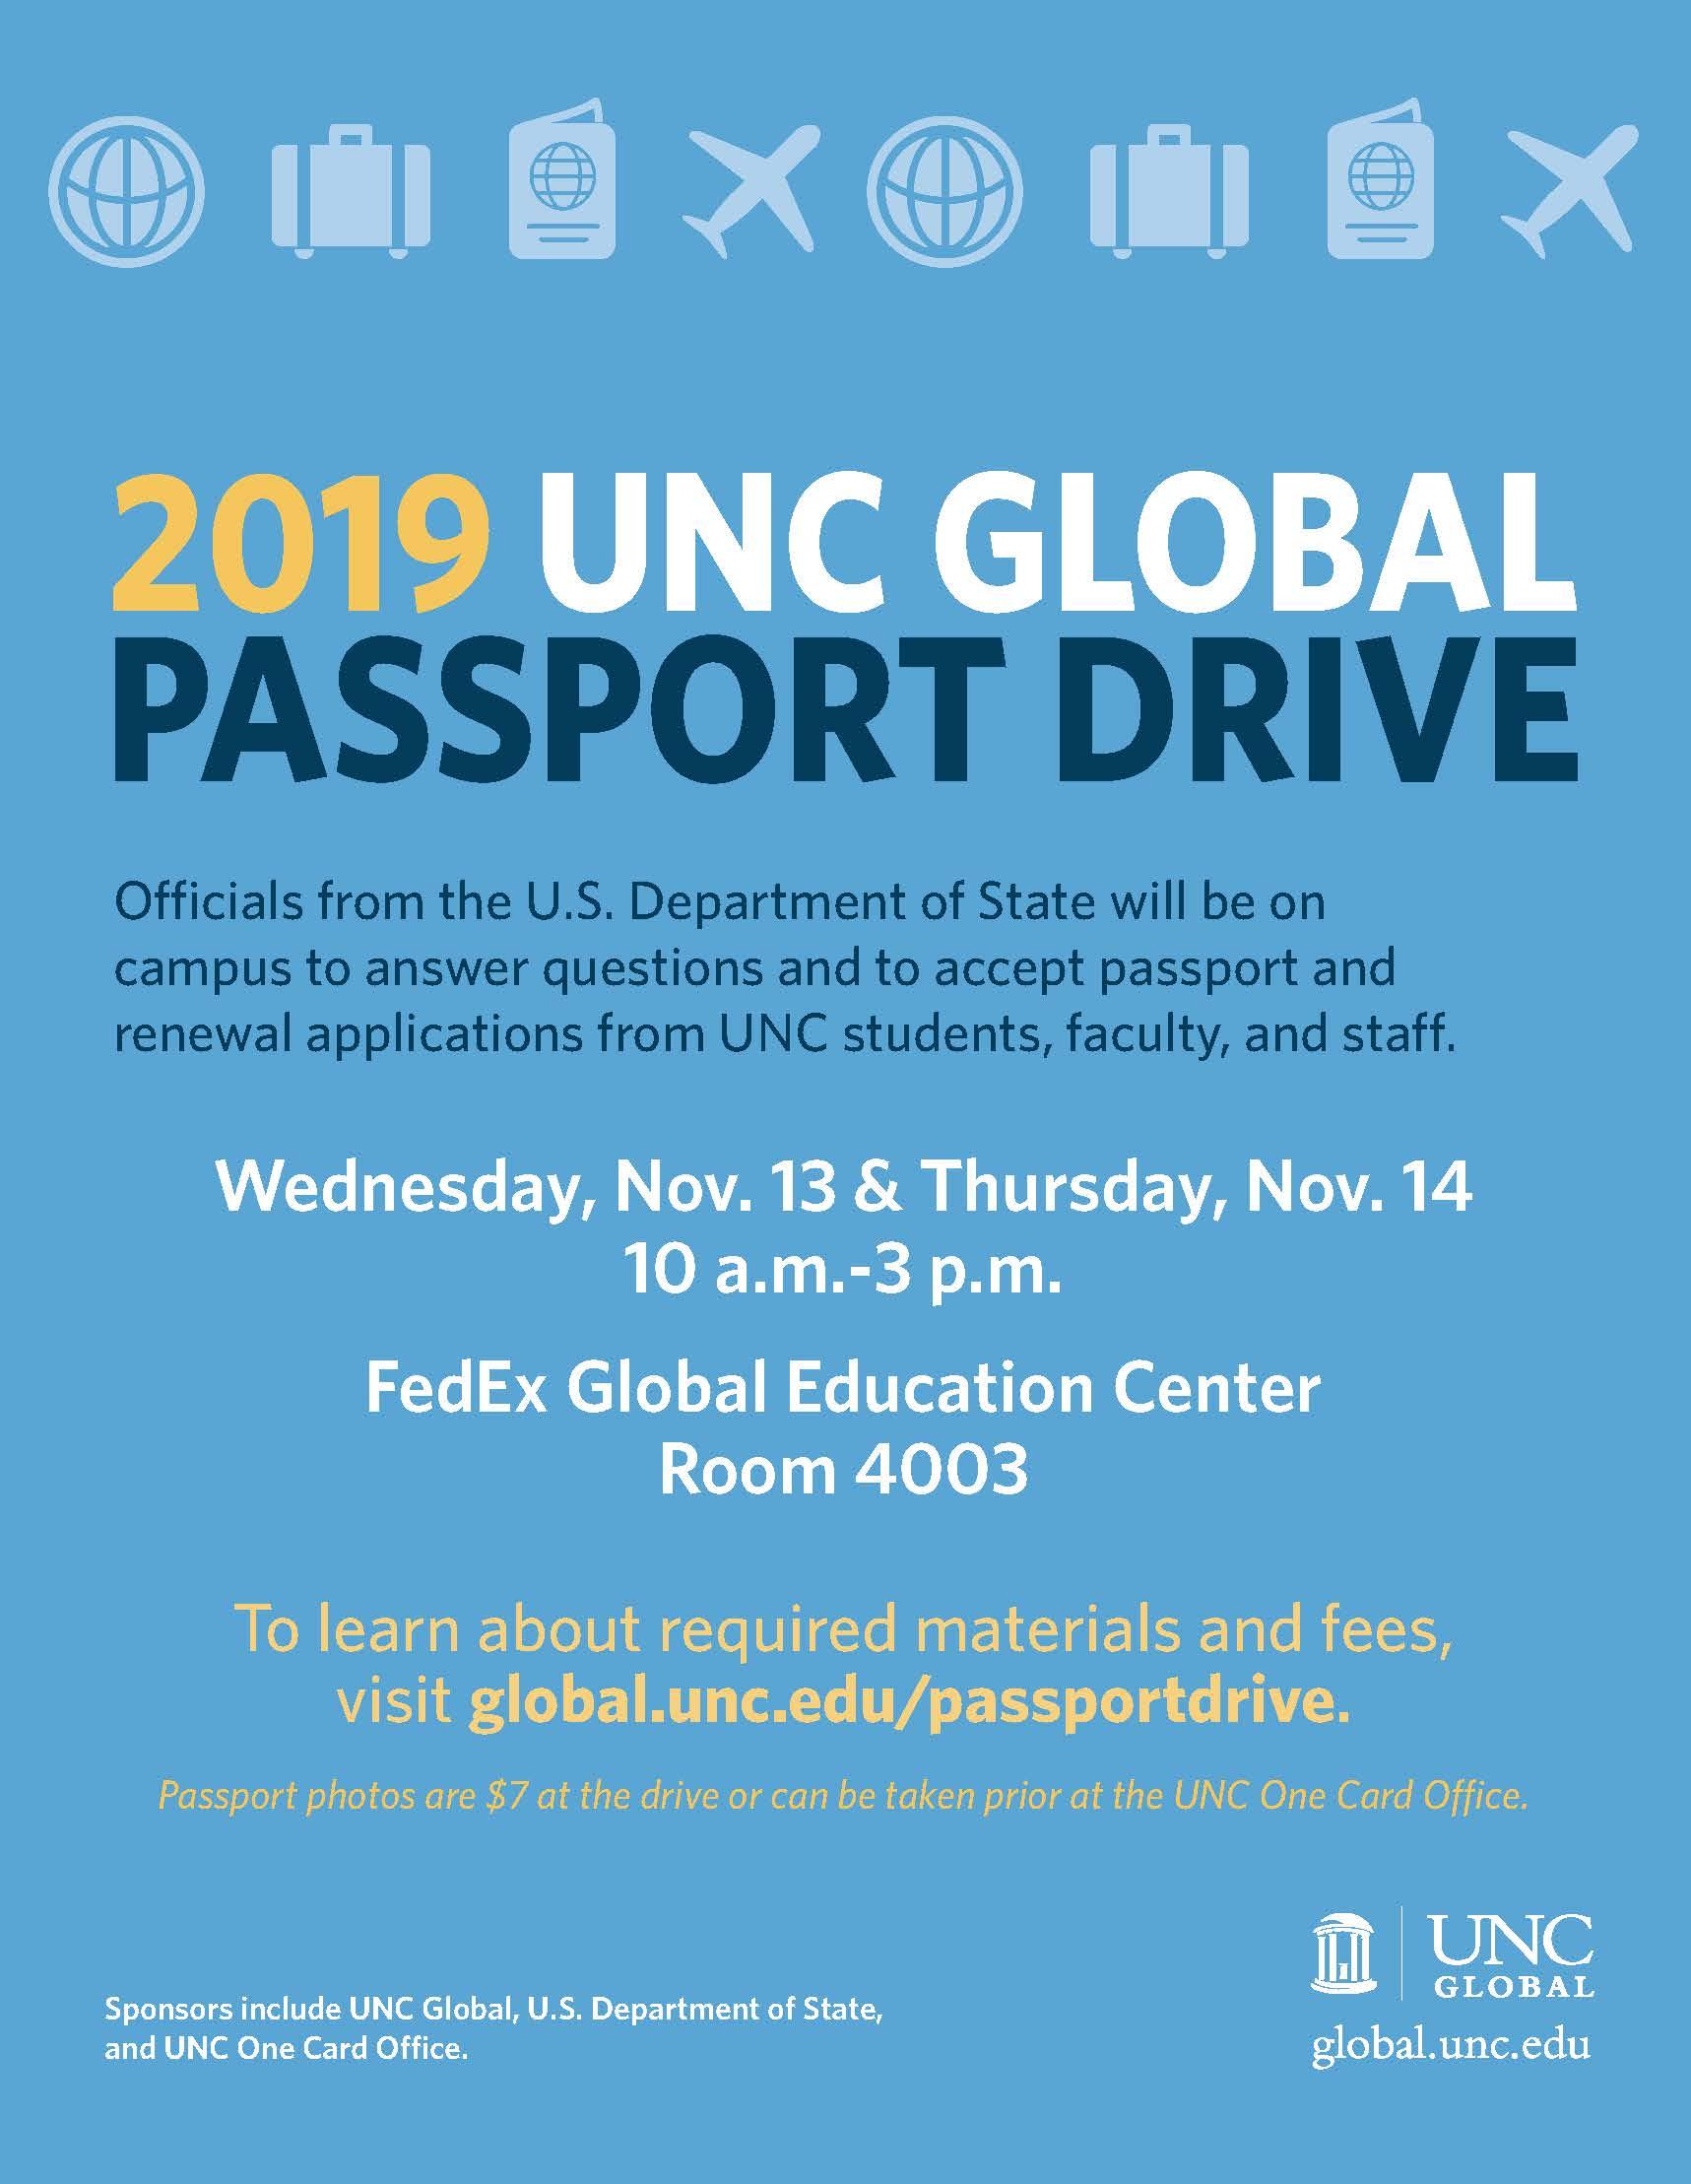 UNC Global Passport Drive